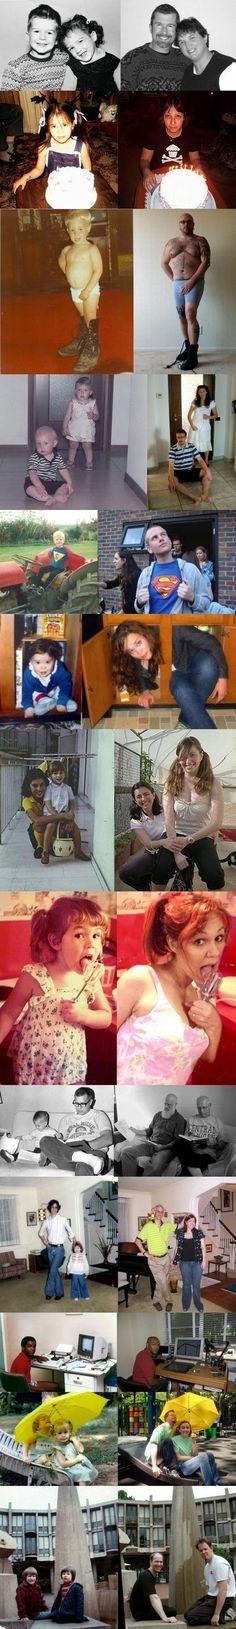 recreate old photos